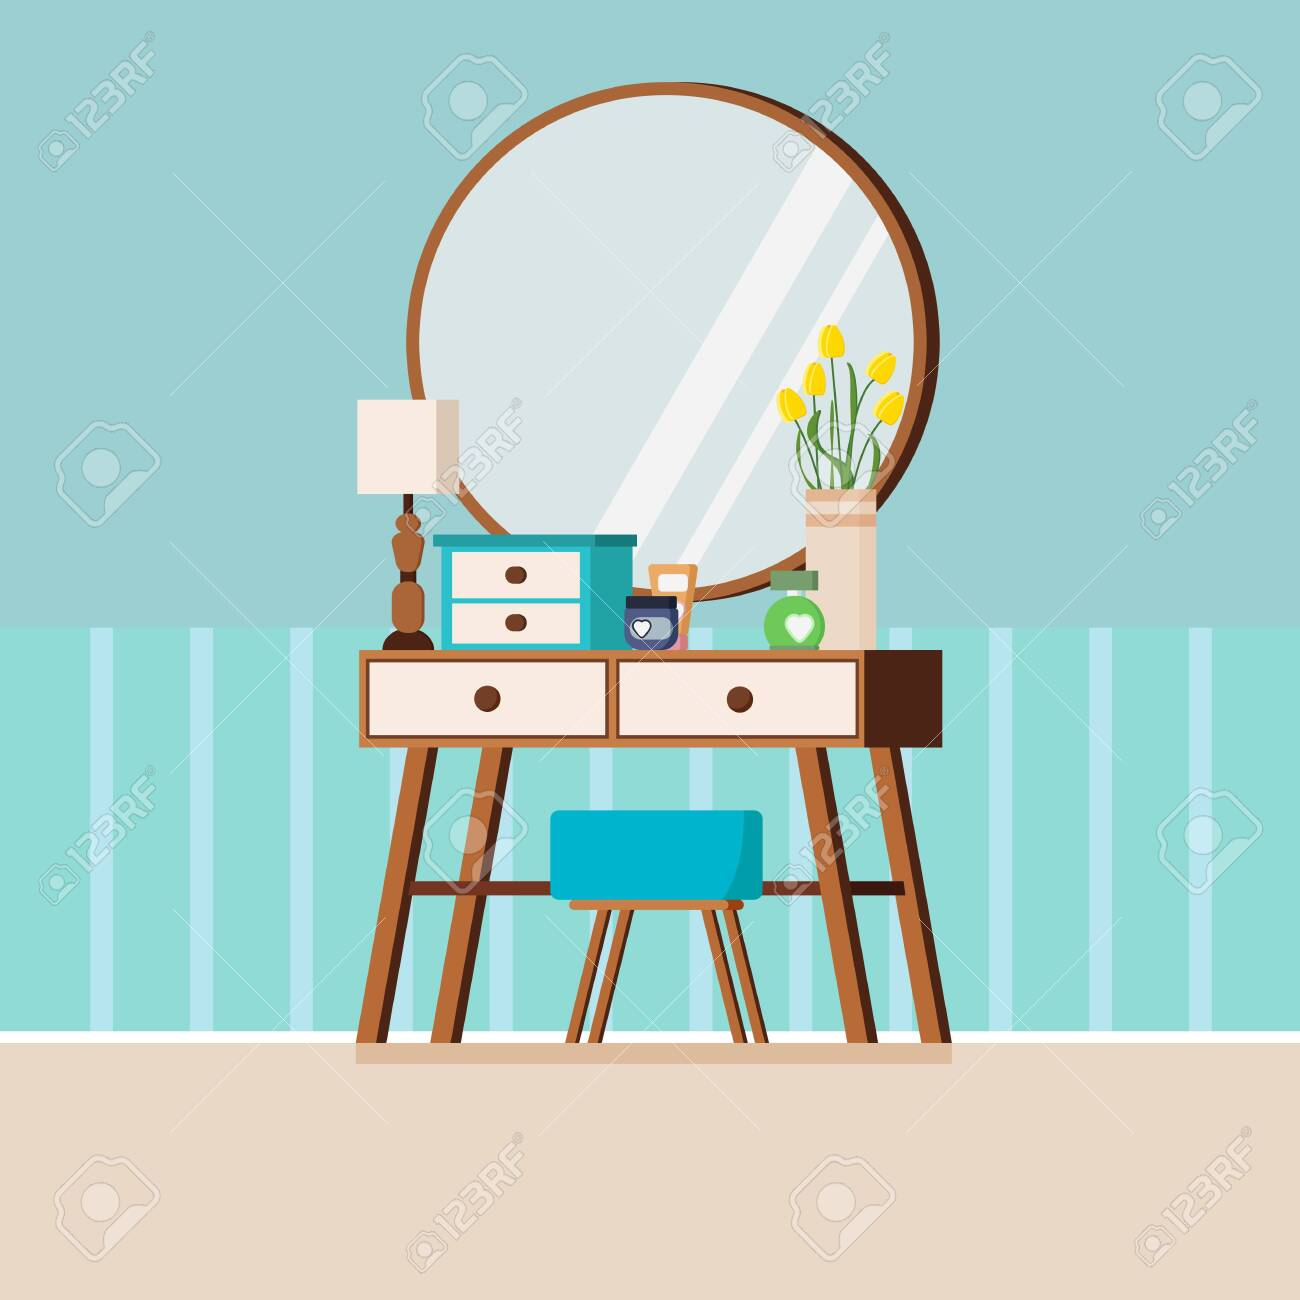 Tremendous Cozy Home Spring Or Summer Interior Background With Books Vase Download Free Architecture Designs Fluibritishbridgeorg